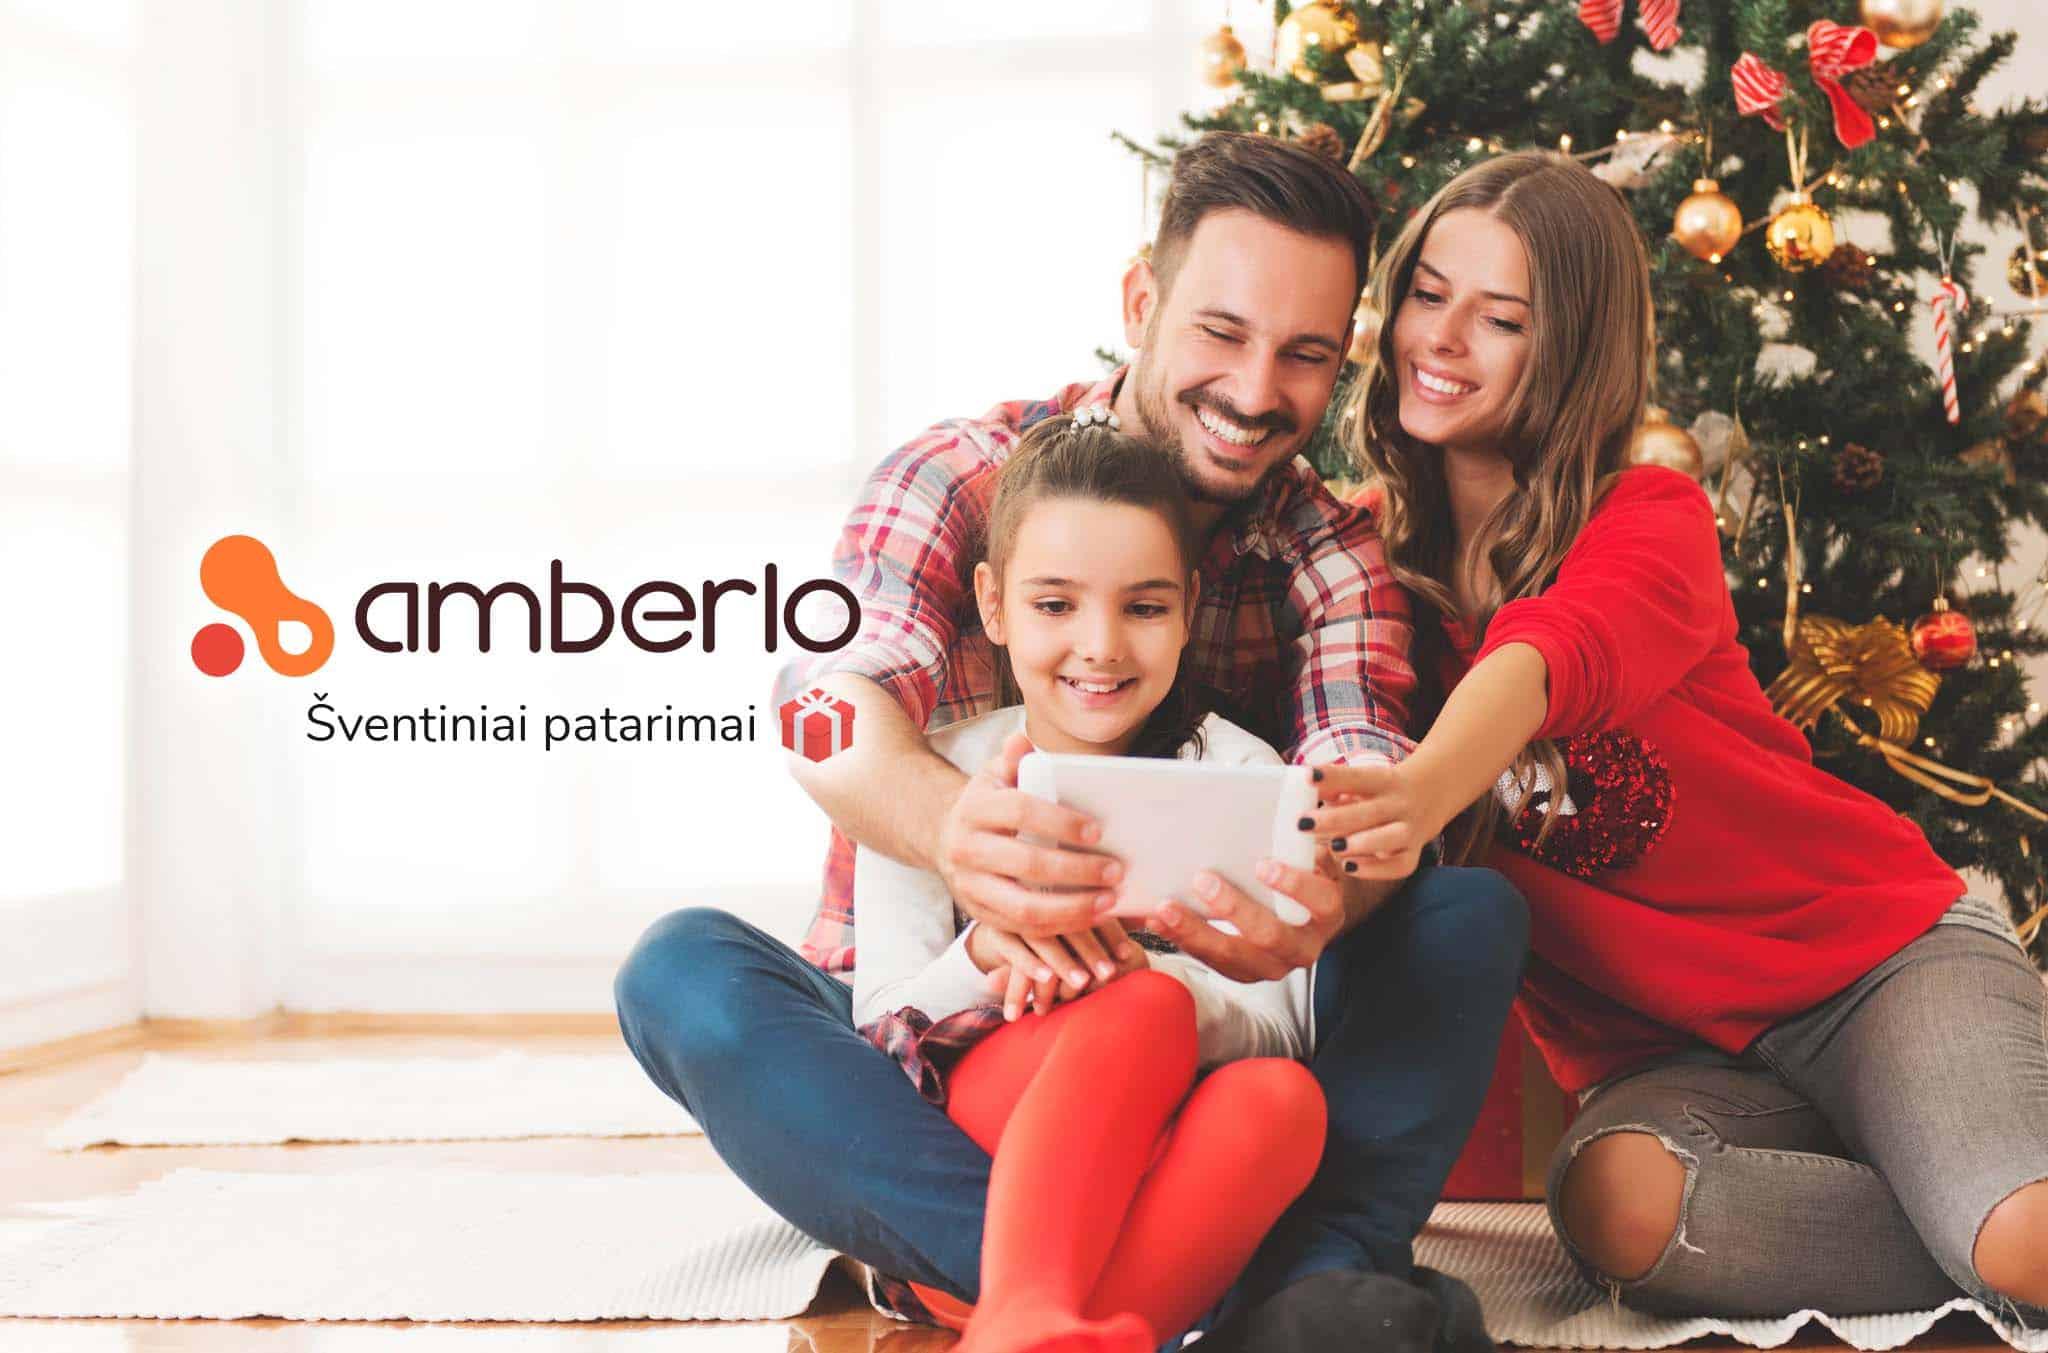 Christmas with smiling people blog image